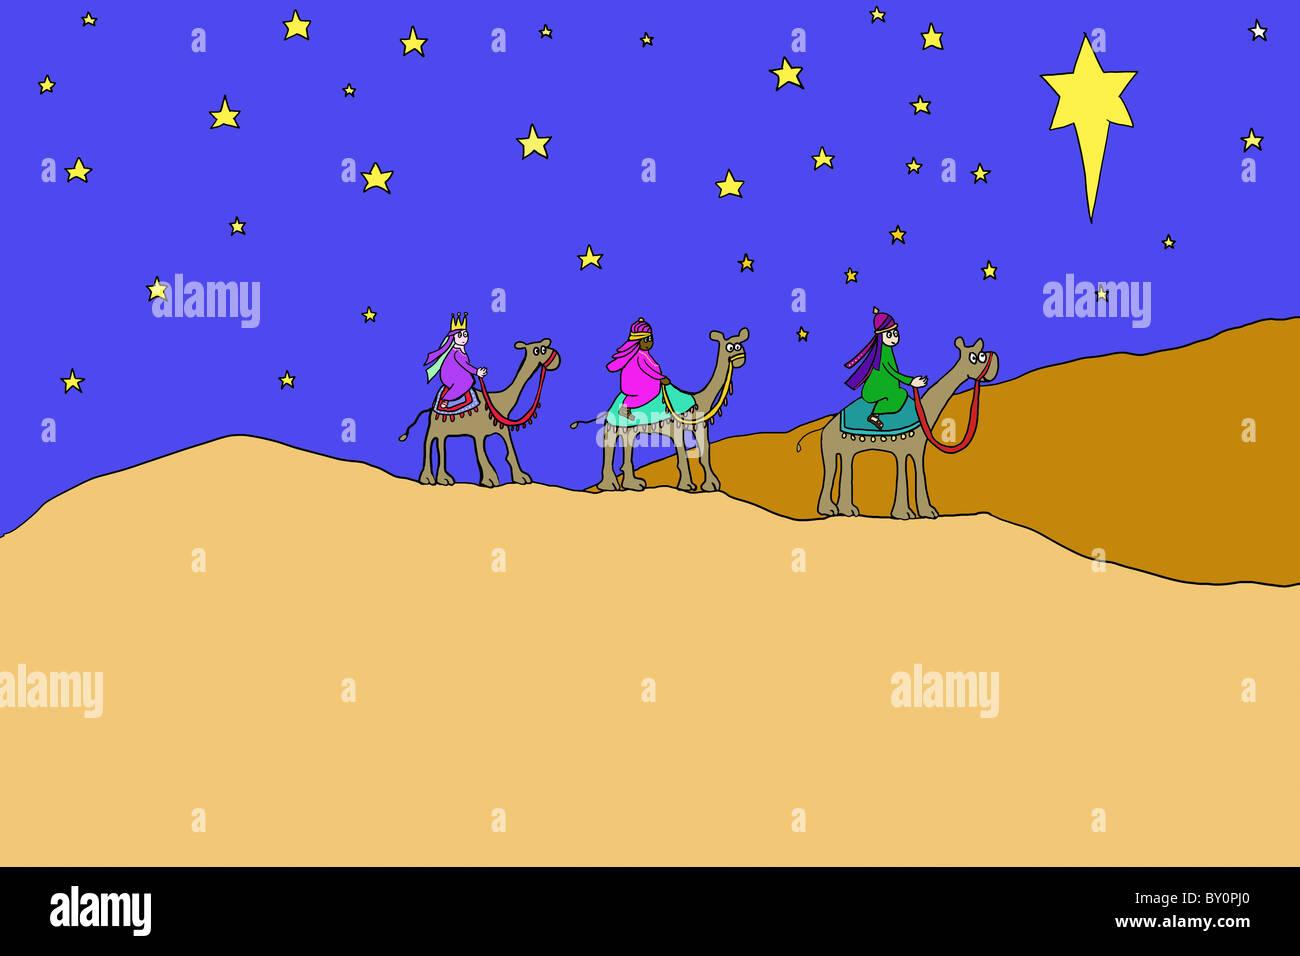 Three wise men following star - Stock Image